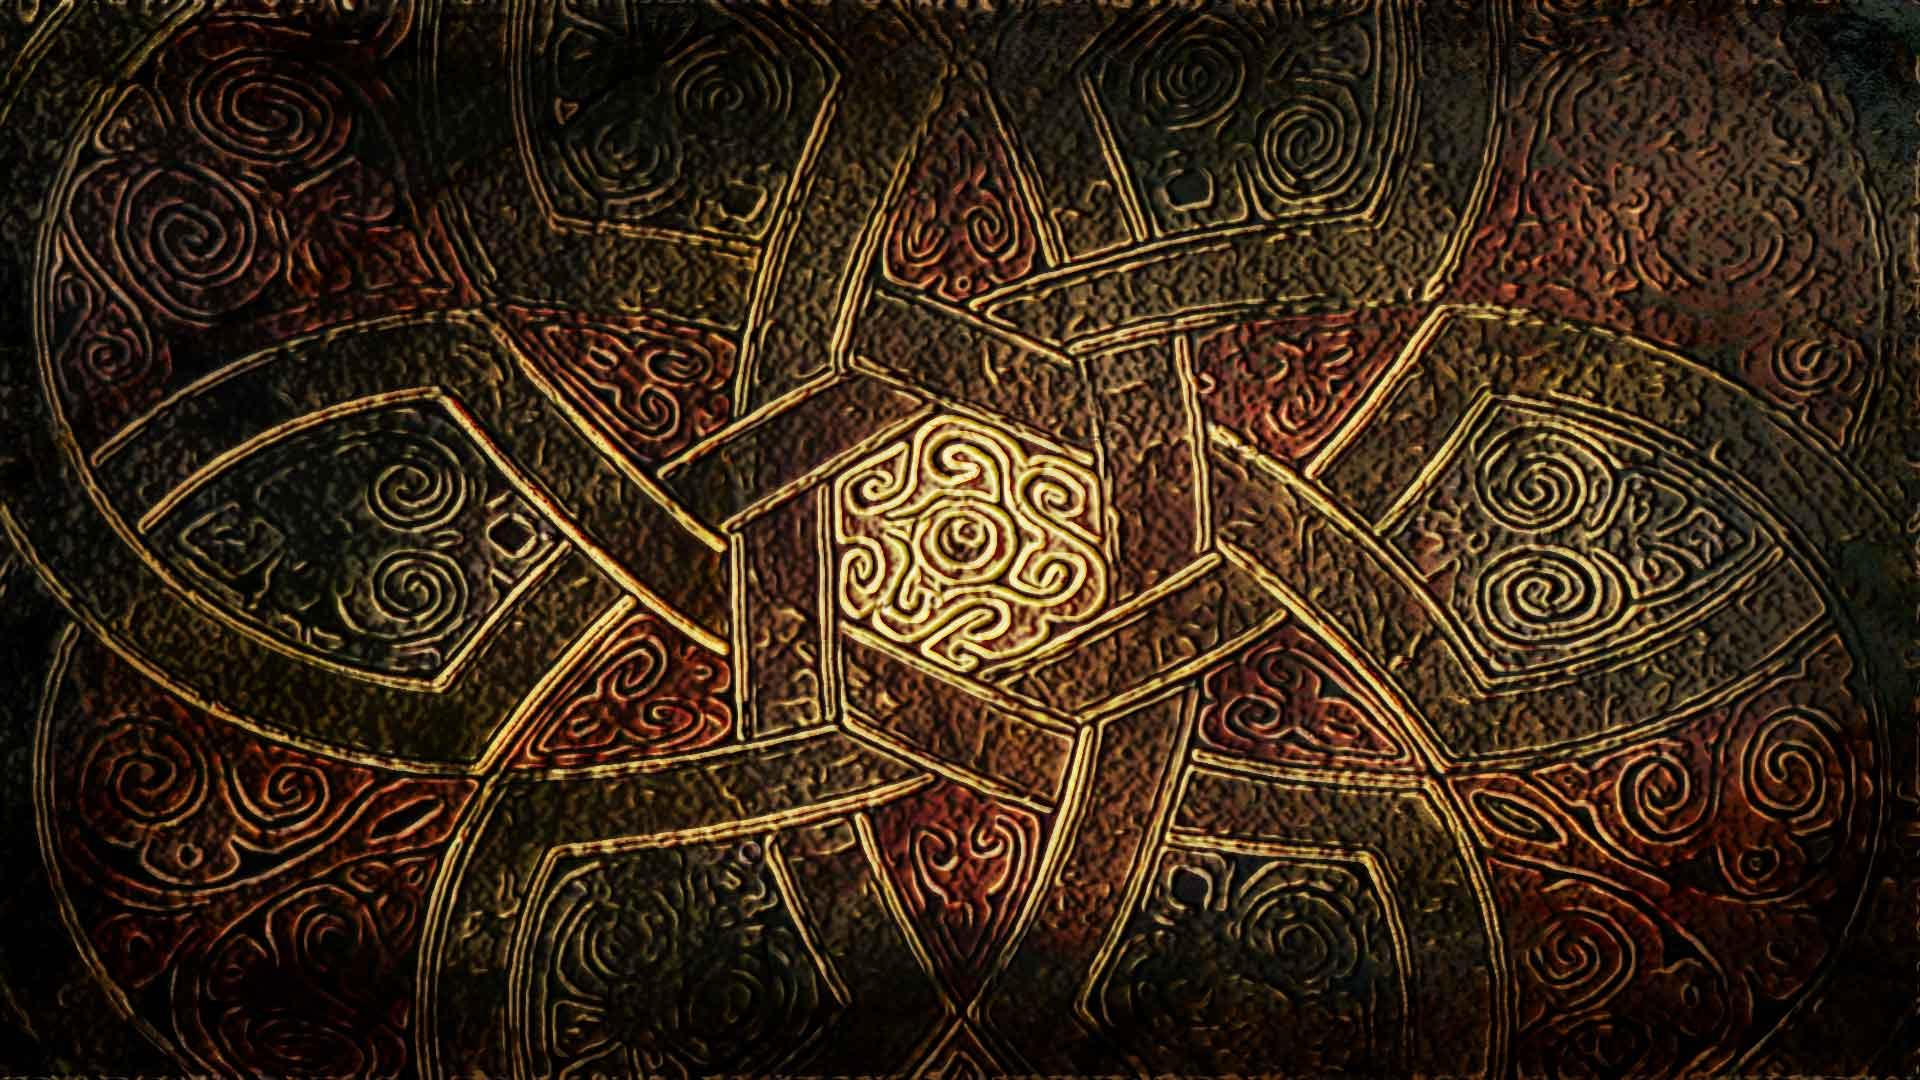 a velvet fabric featuring a Celtic knot design